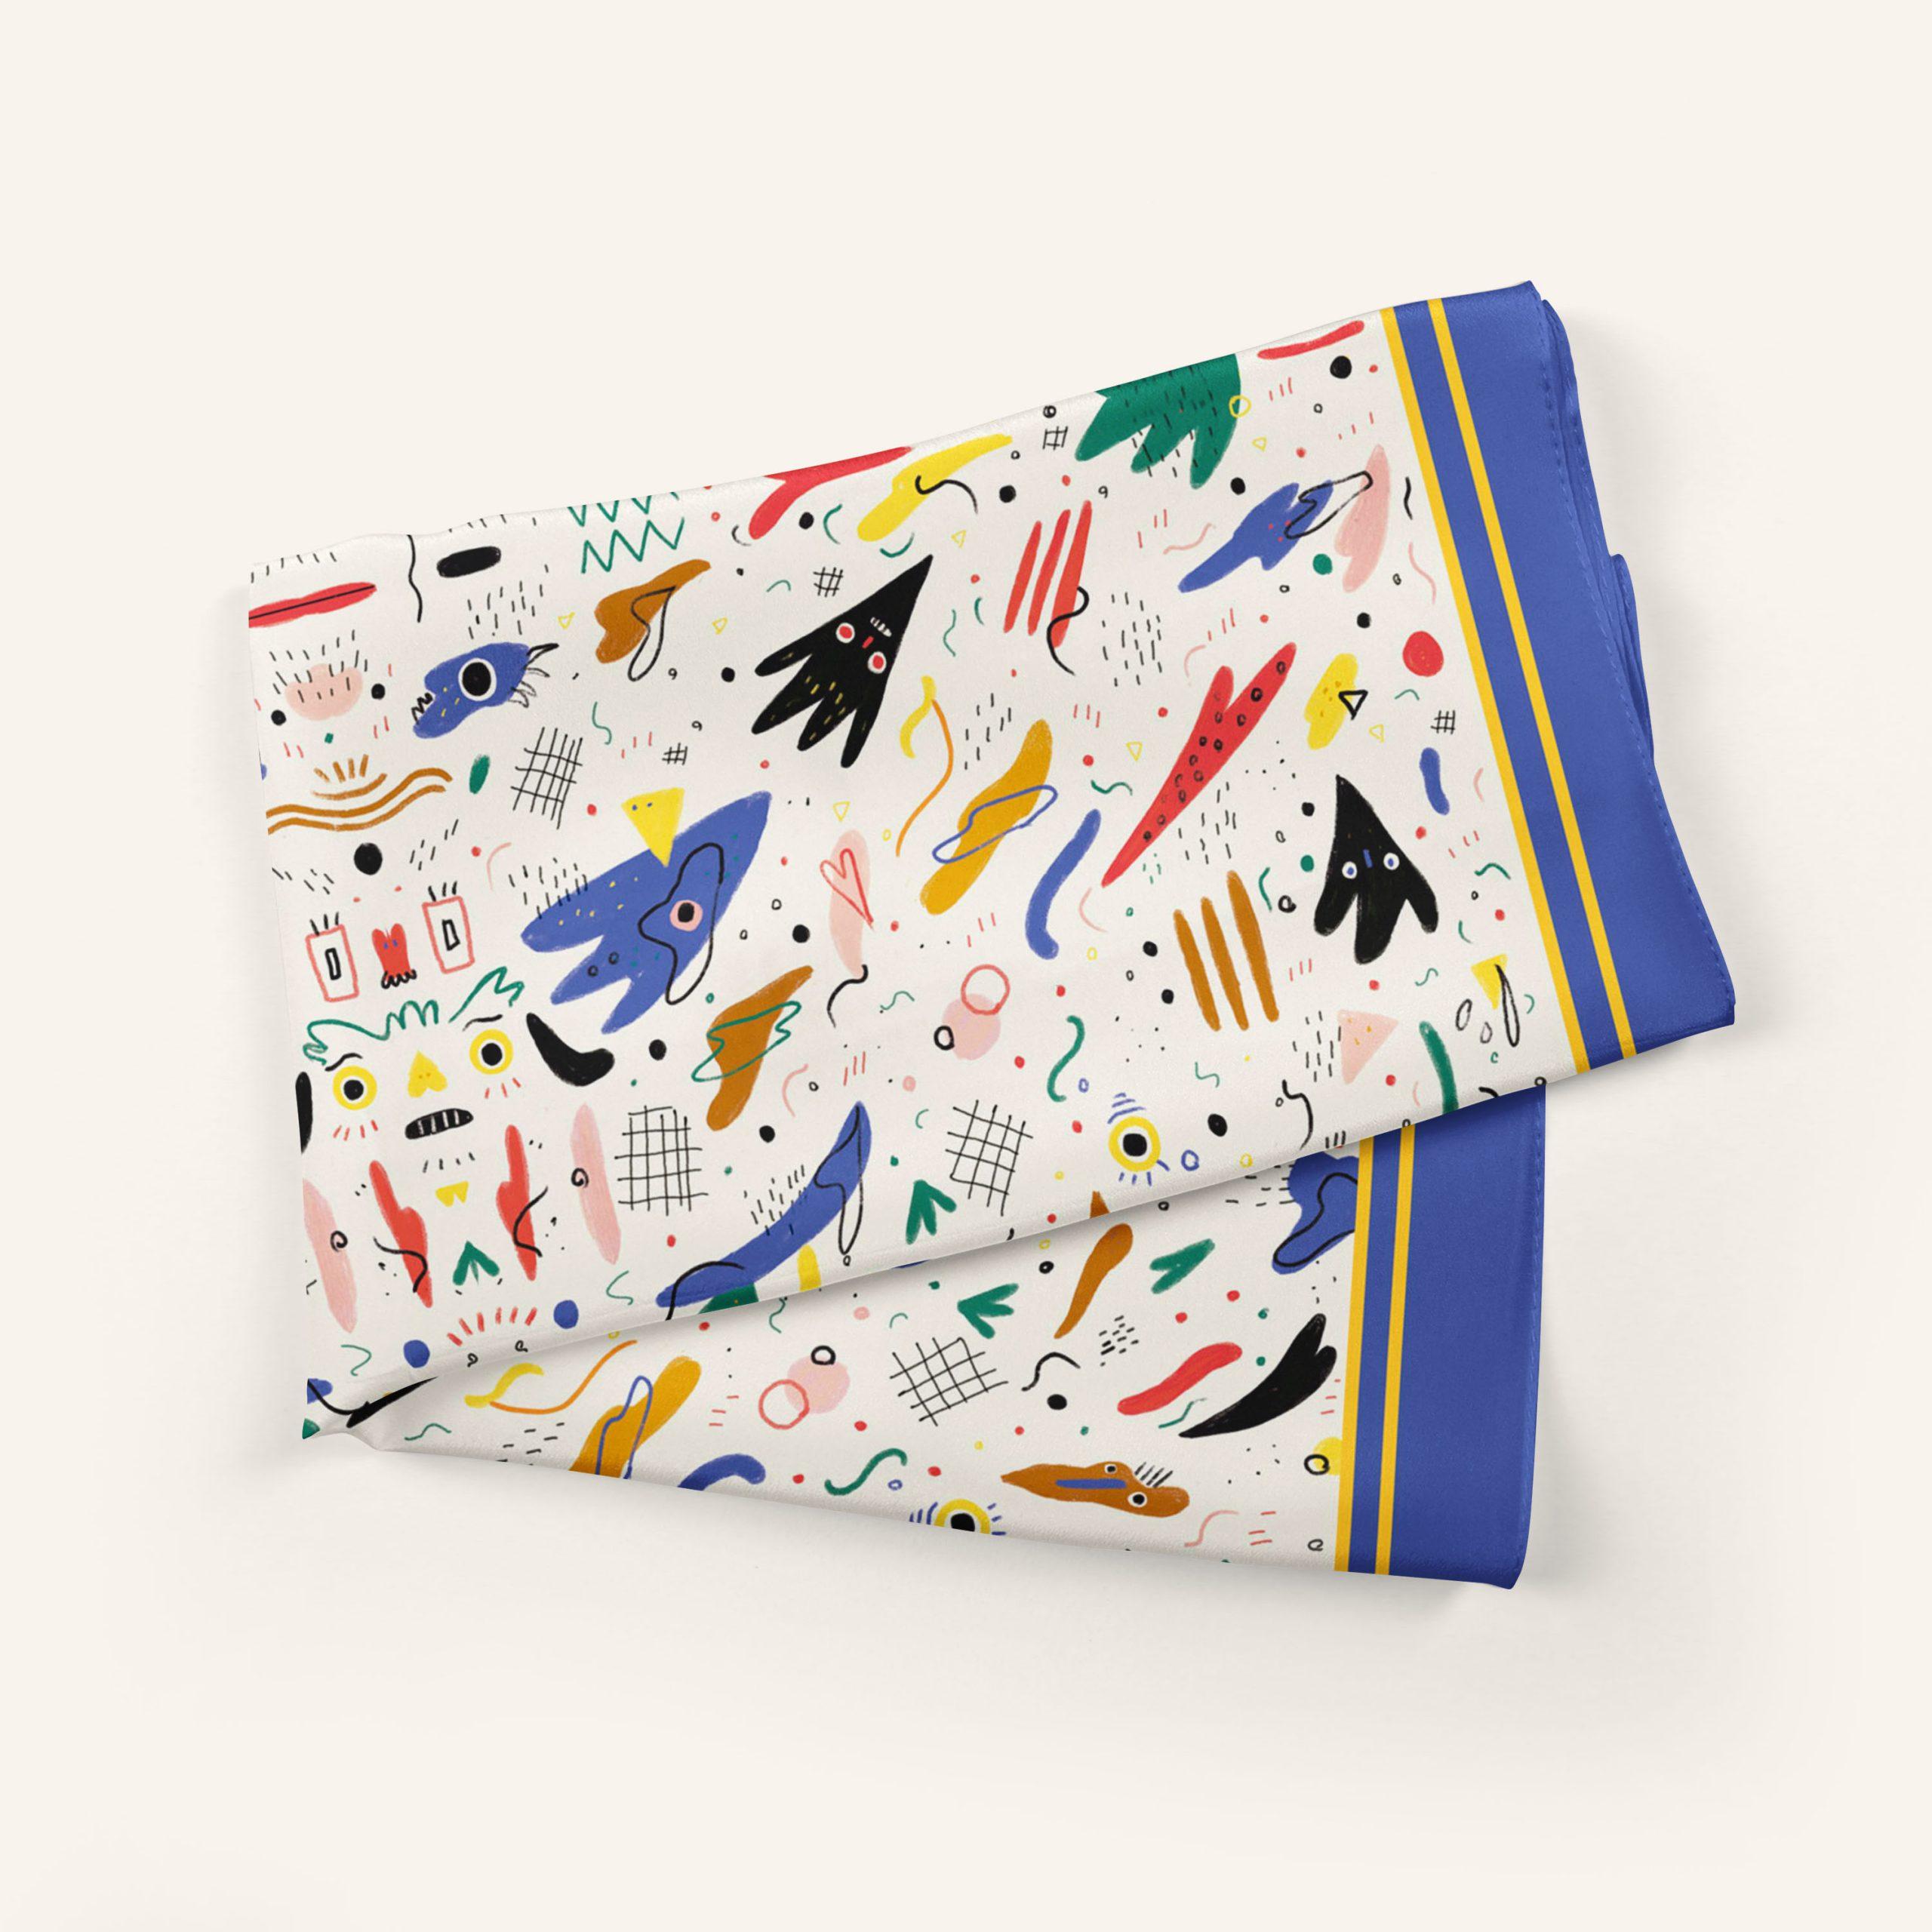 Catalina Vásquez Patterns textiles